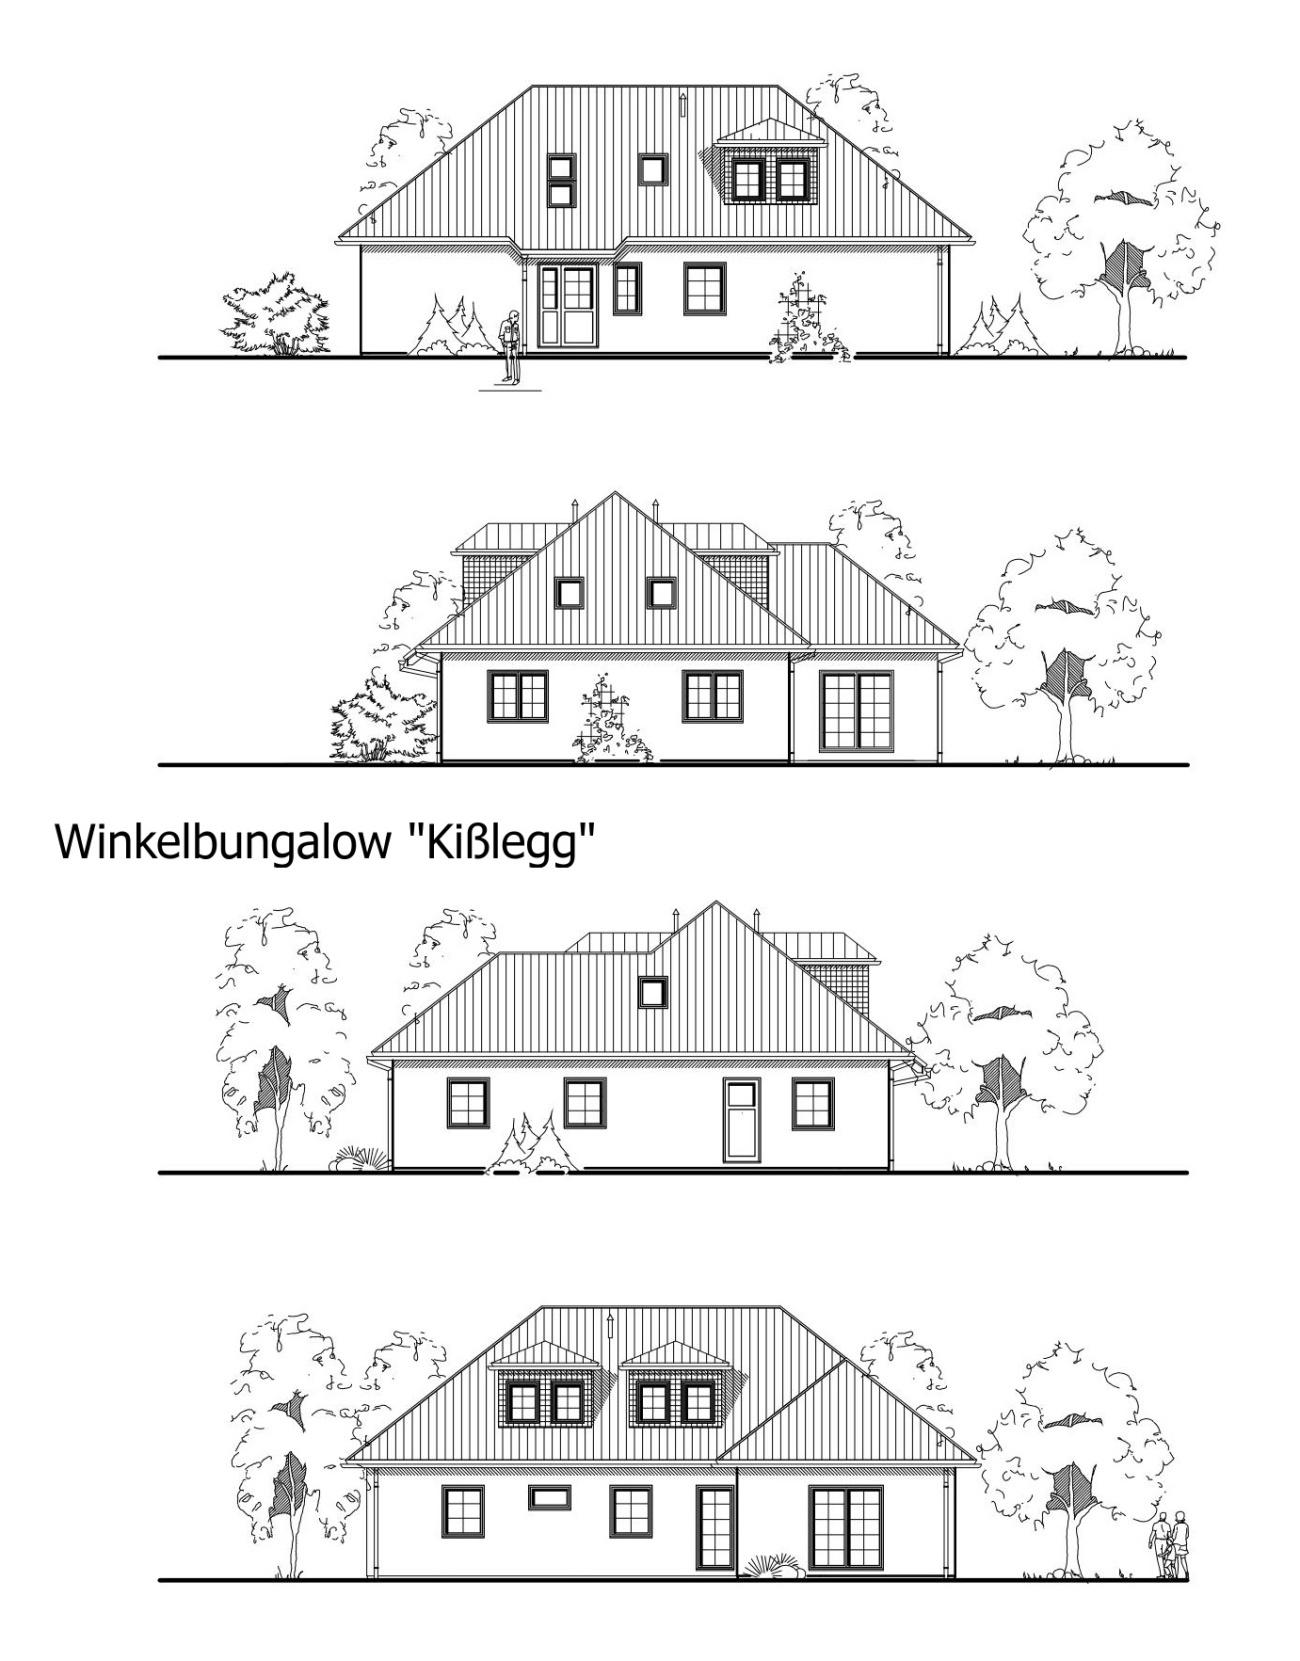 Winkelbungalow KIßLEGG